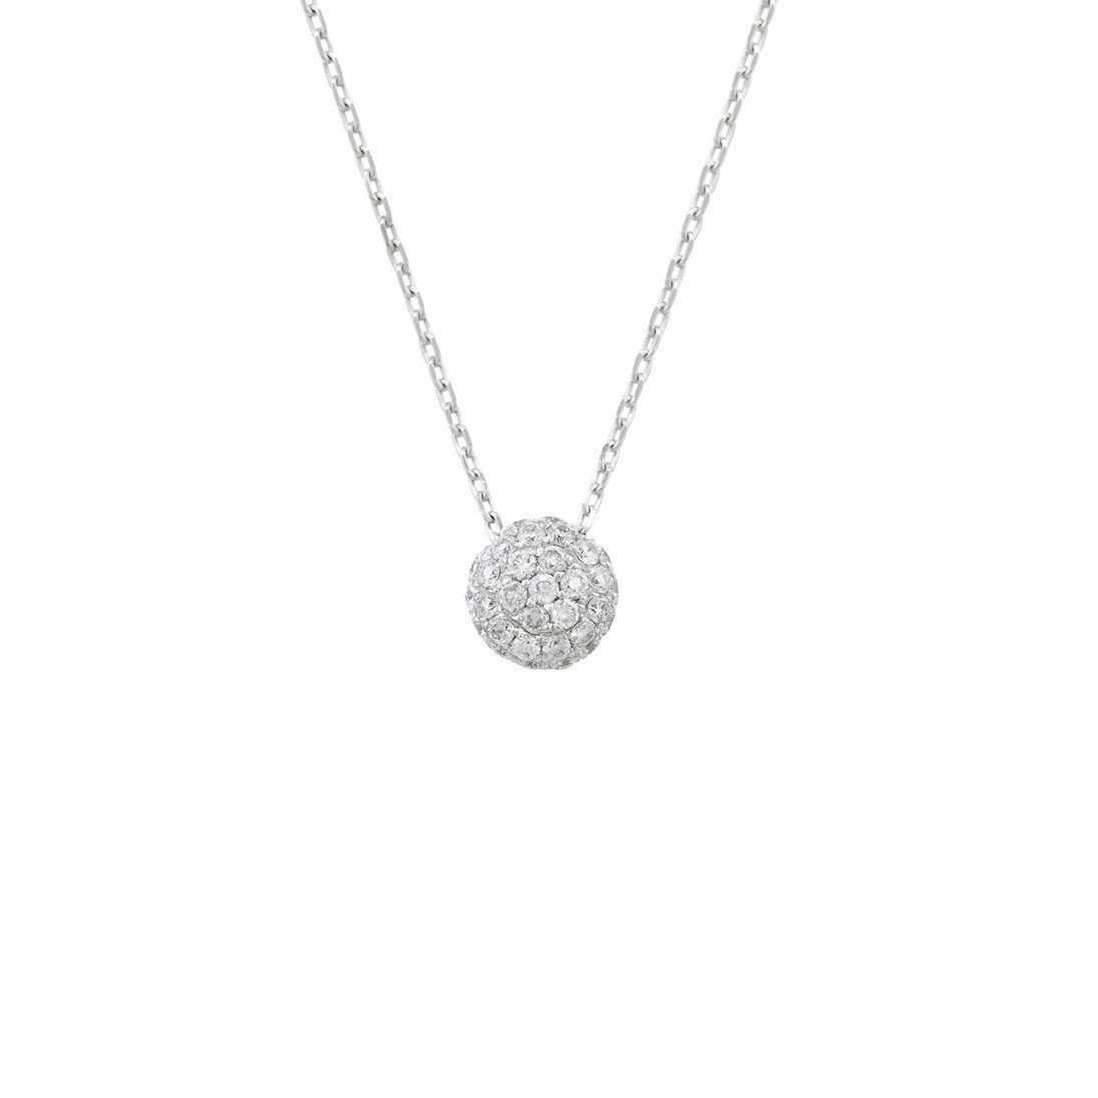 London Road Jewellery Bloomsbury White Gold Black Diamond Ball Pendant 2Ovbow1Dk